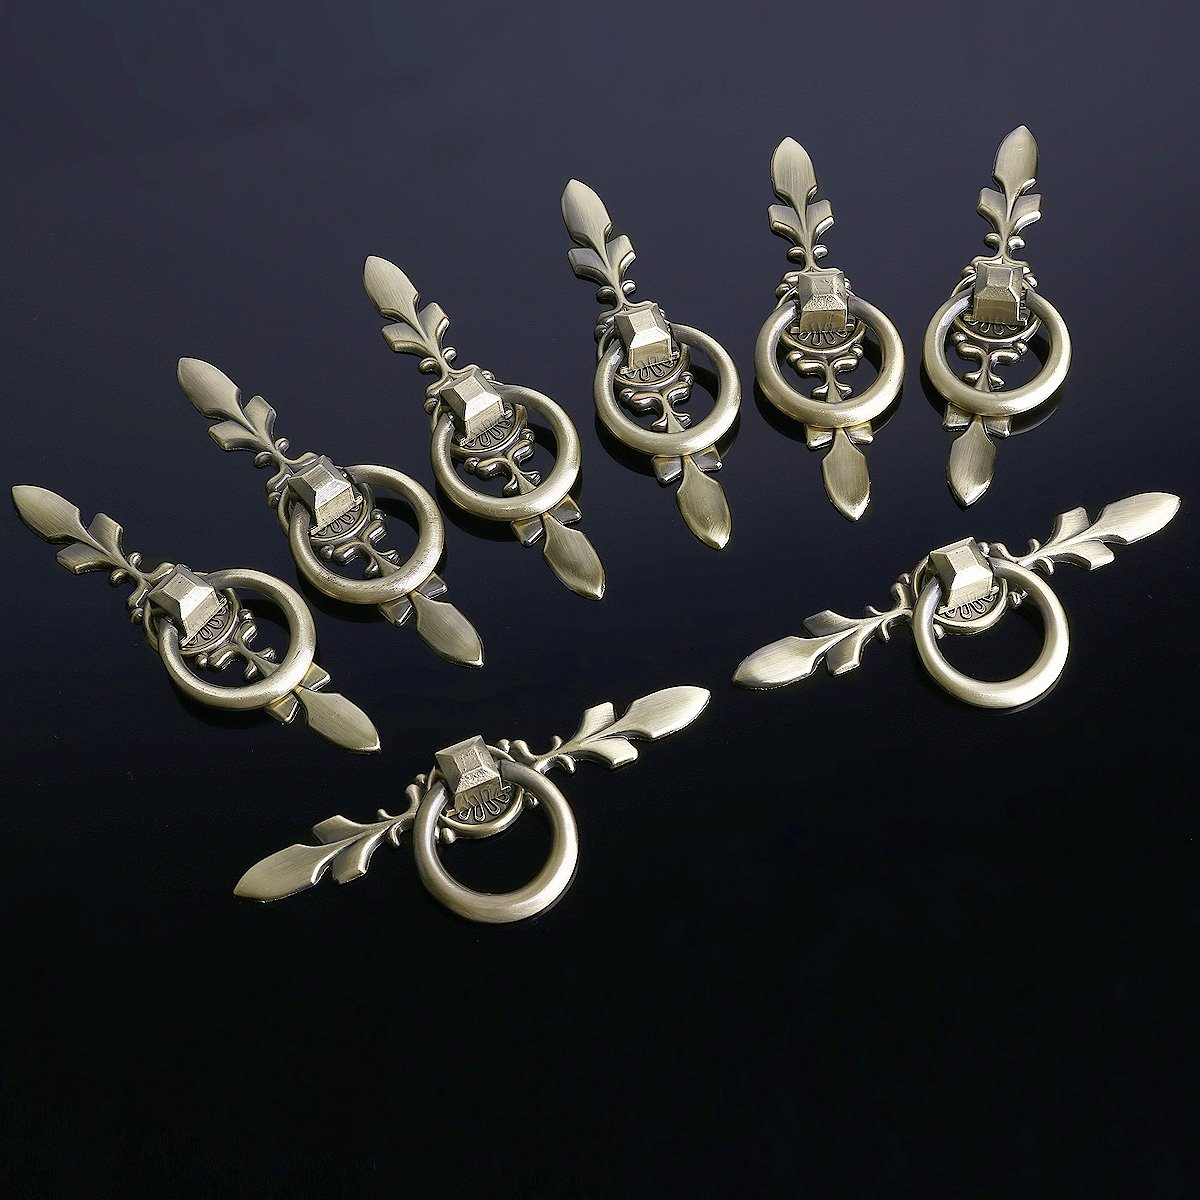 8er Antik Design Messing-Look M/öbelkn/öpfe Griffe M/öbelKnopf Schubladengriff mit Ringe